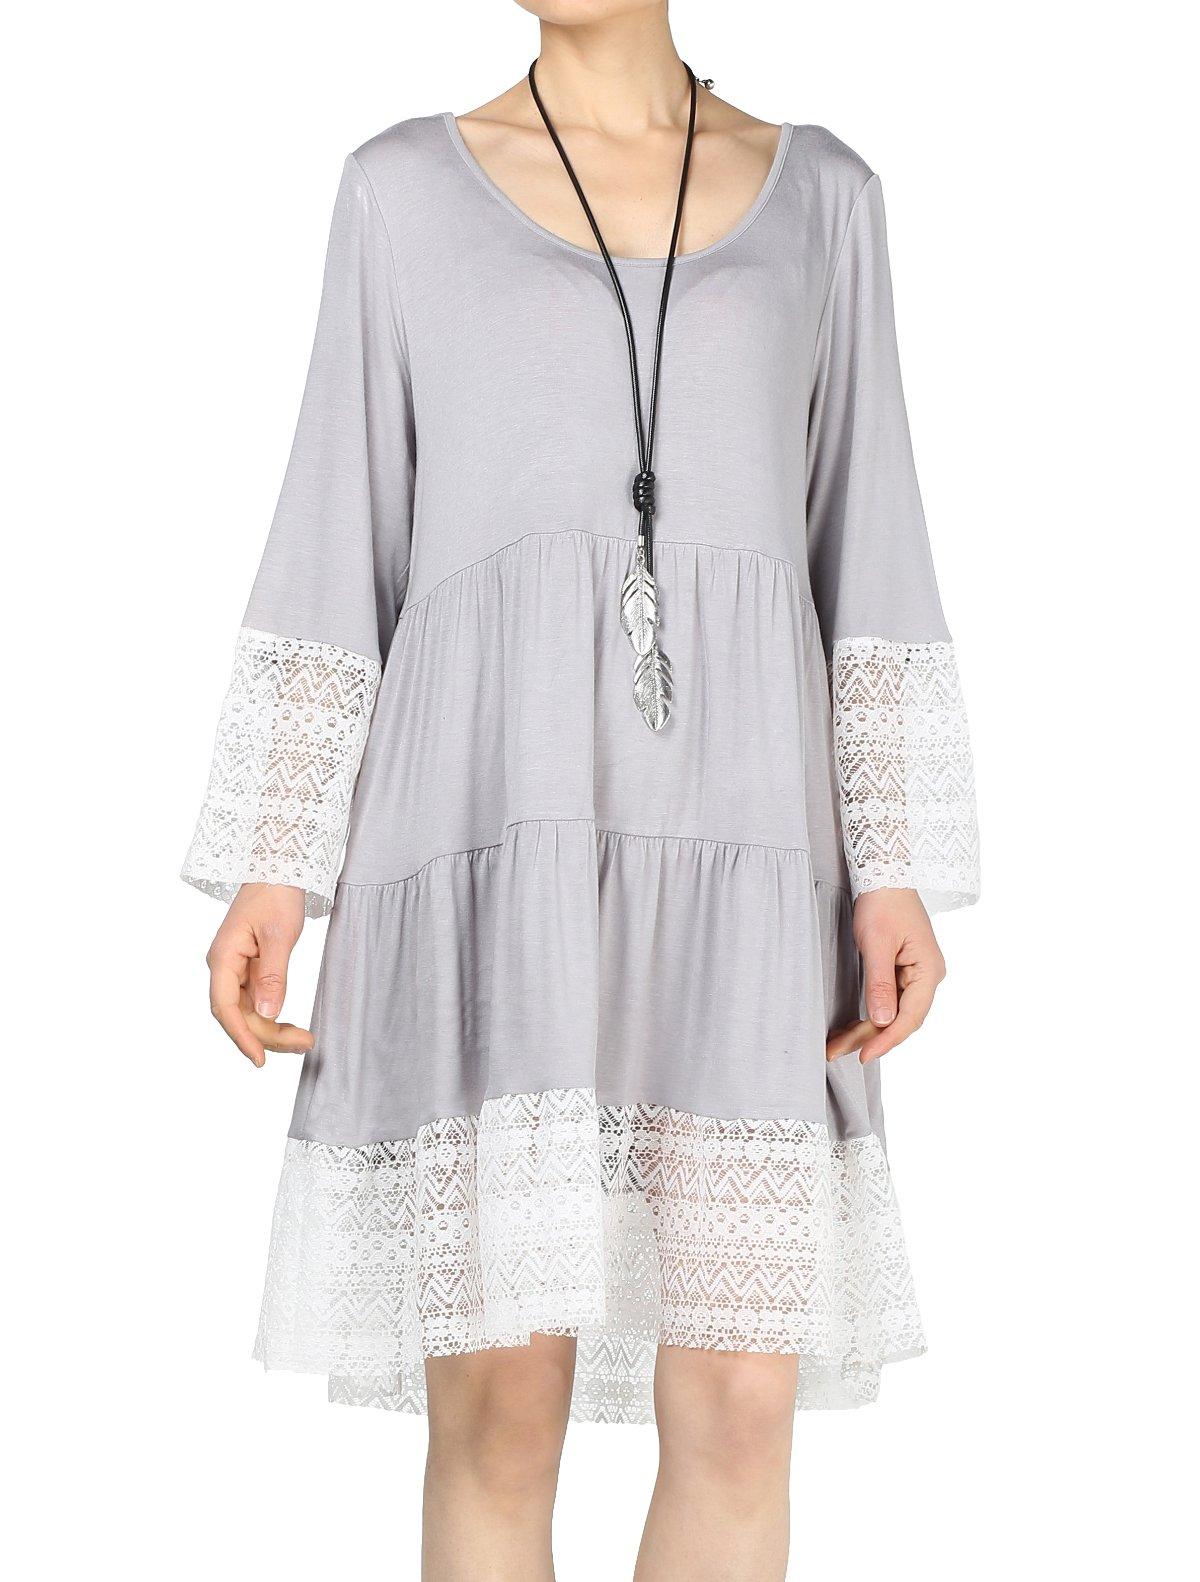 Mordenmiss Women's Flared Tunics Dress Lace Trim Boho Shirts with Side Pockets XL Light Gray